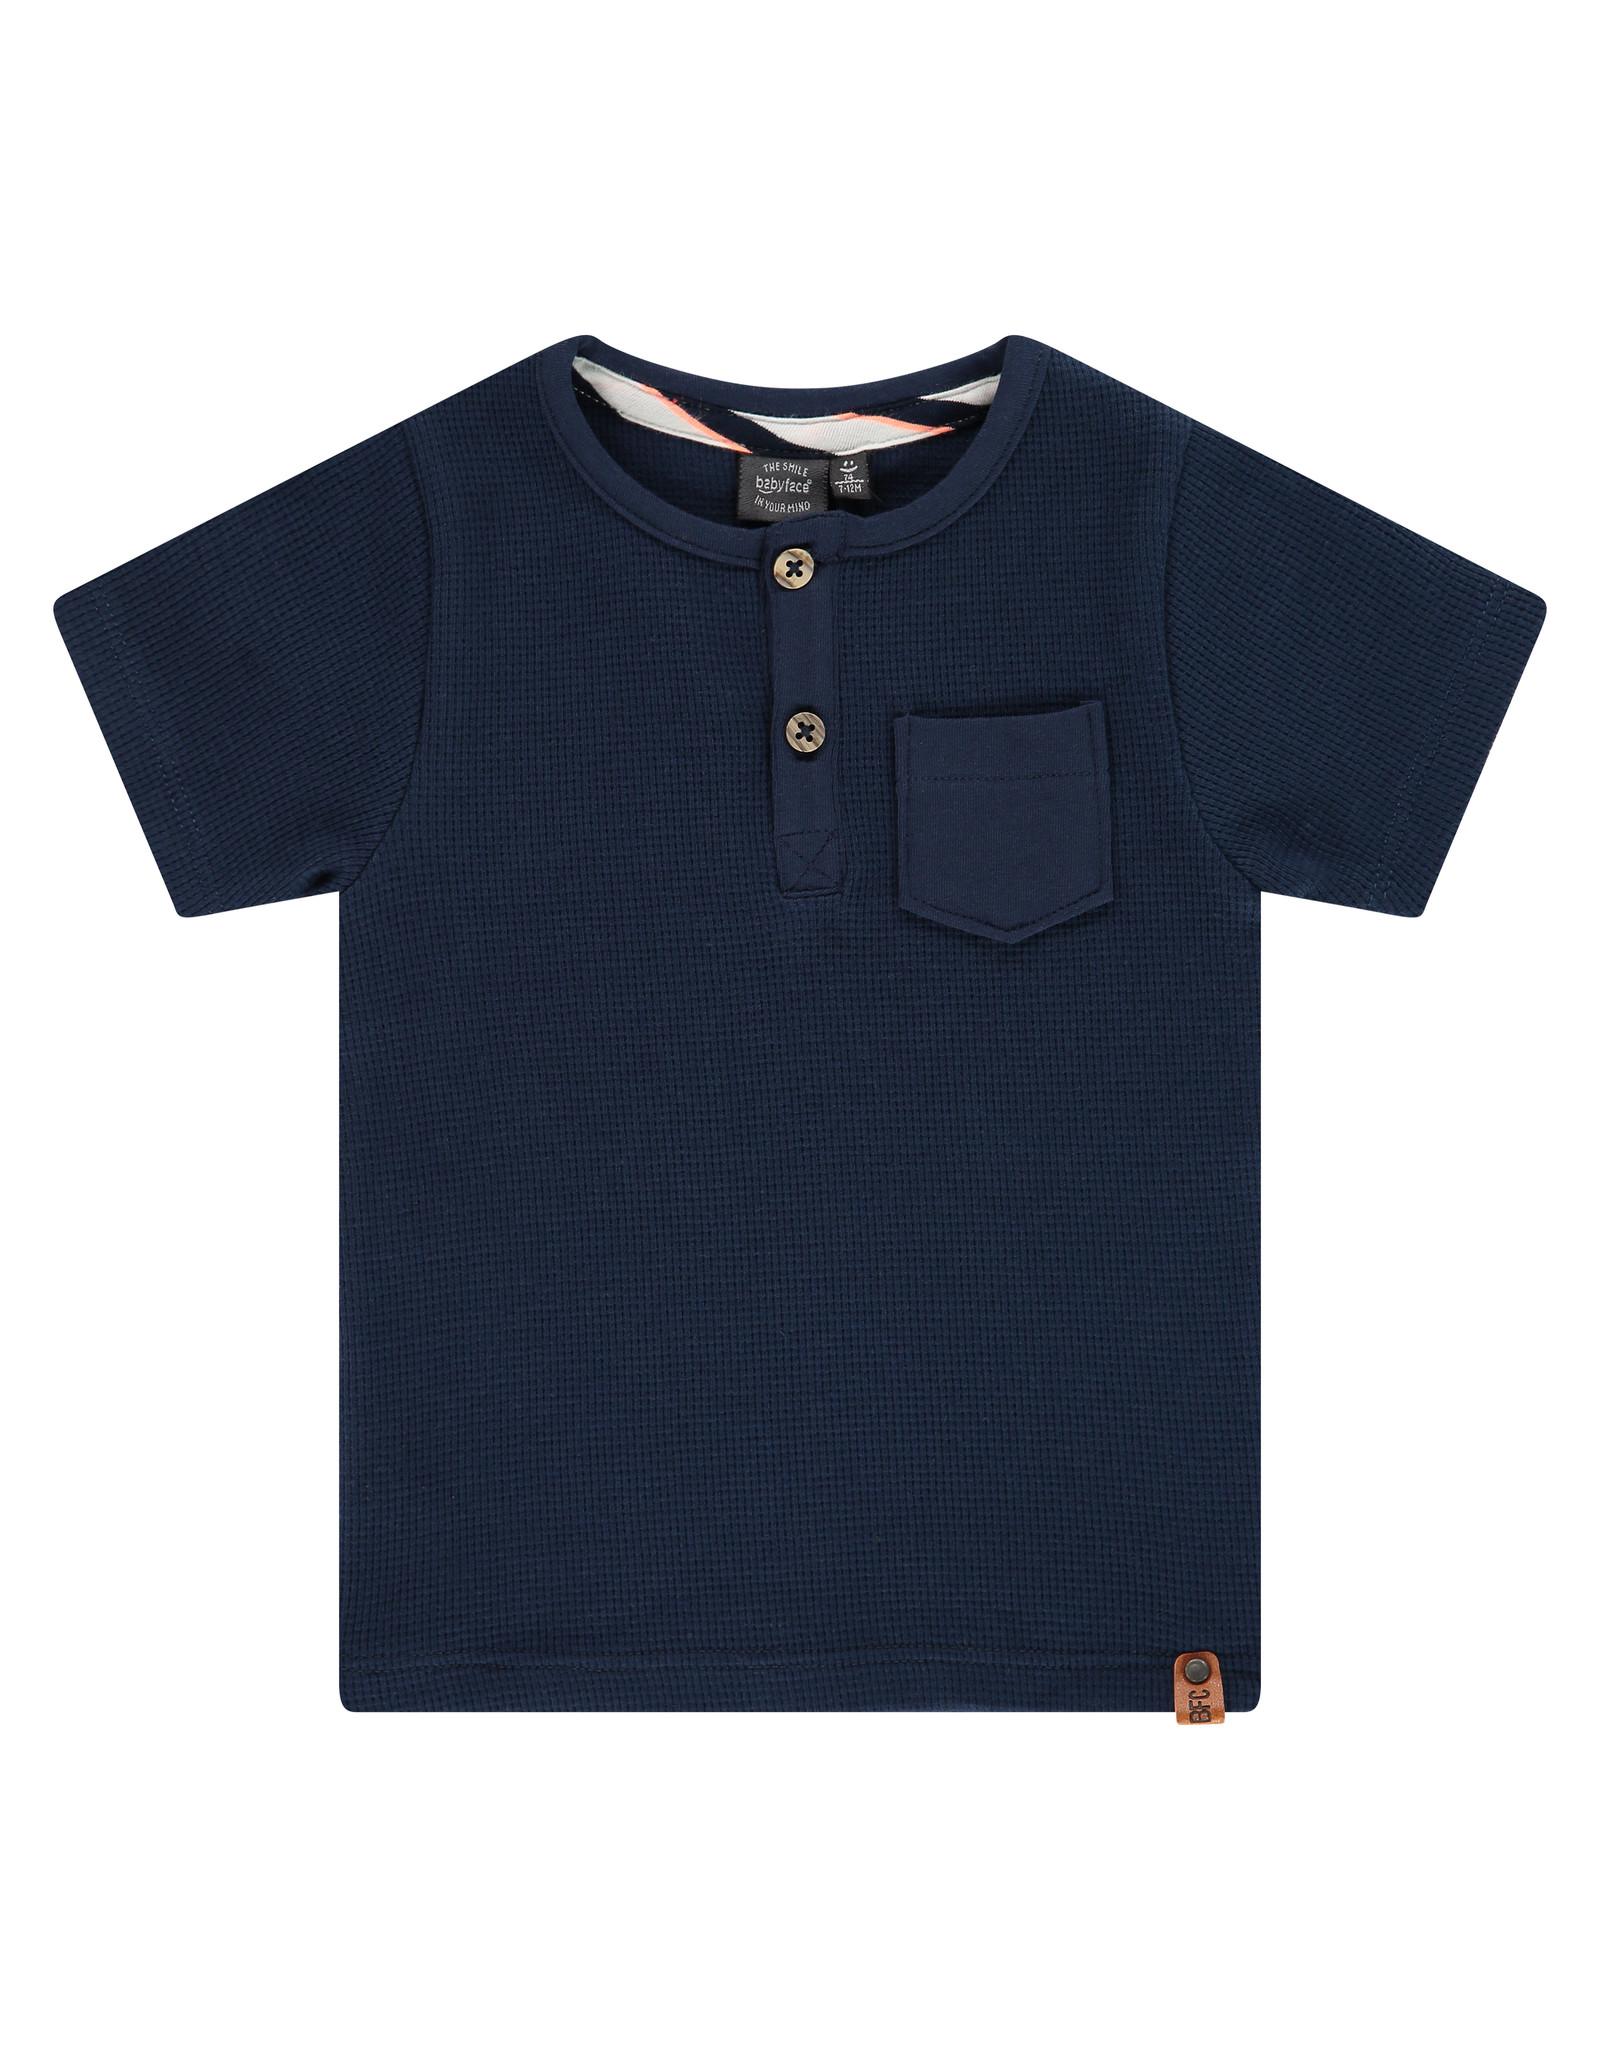 Babyface boys t-shirt short sleeve, navy, BBE21107637